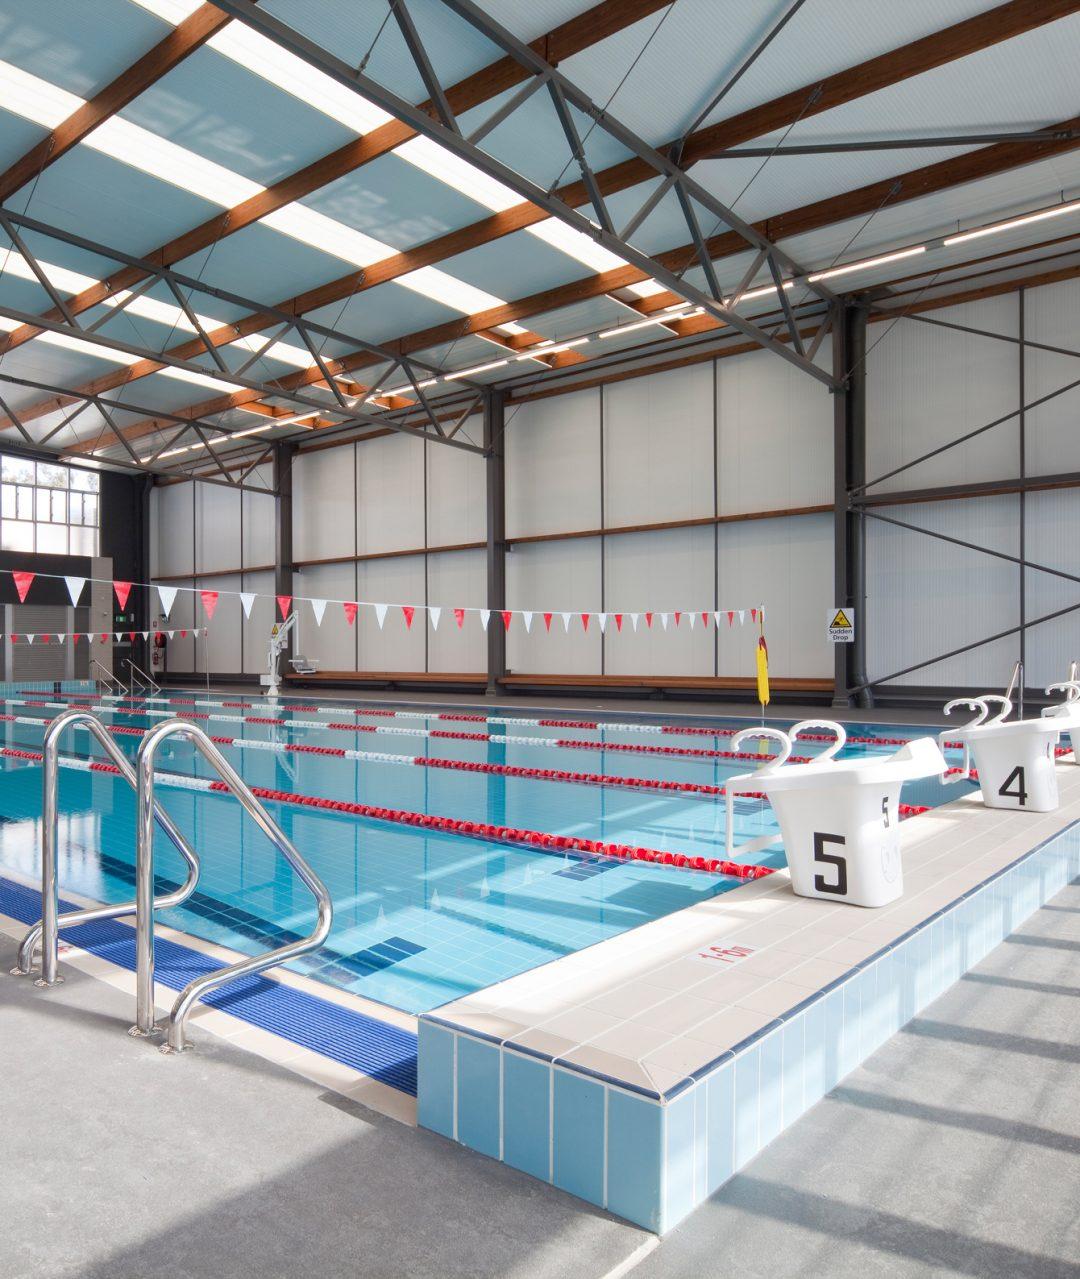 Sydney Gymnastics & Aquatic Centre